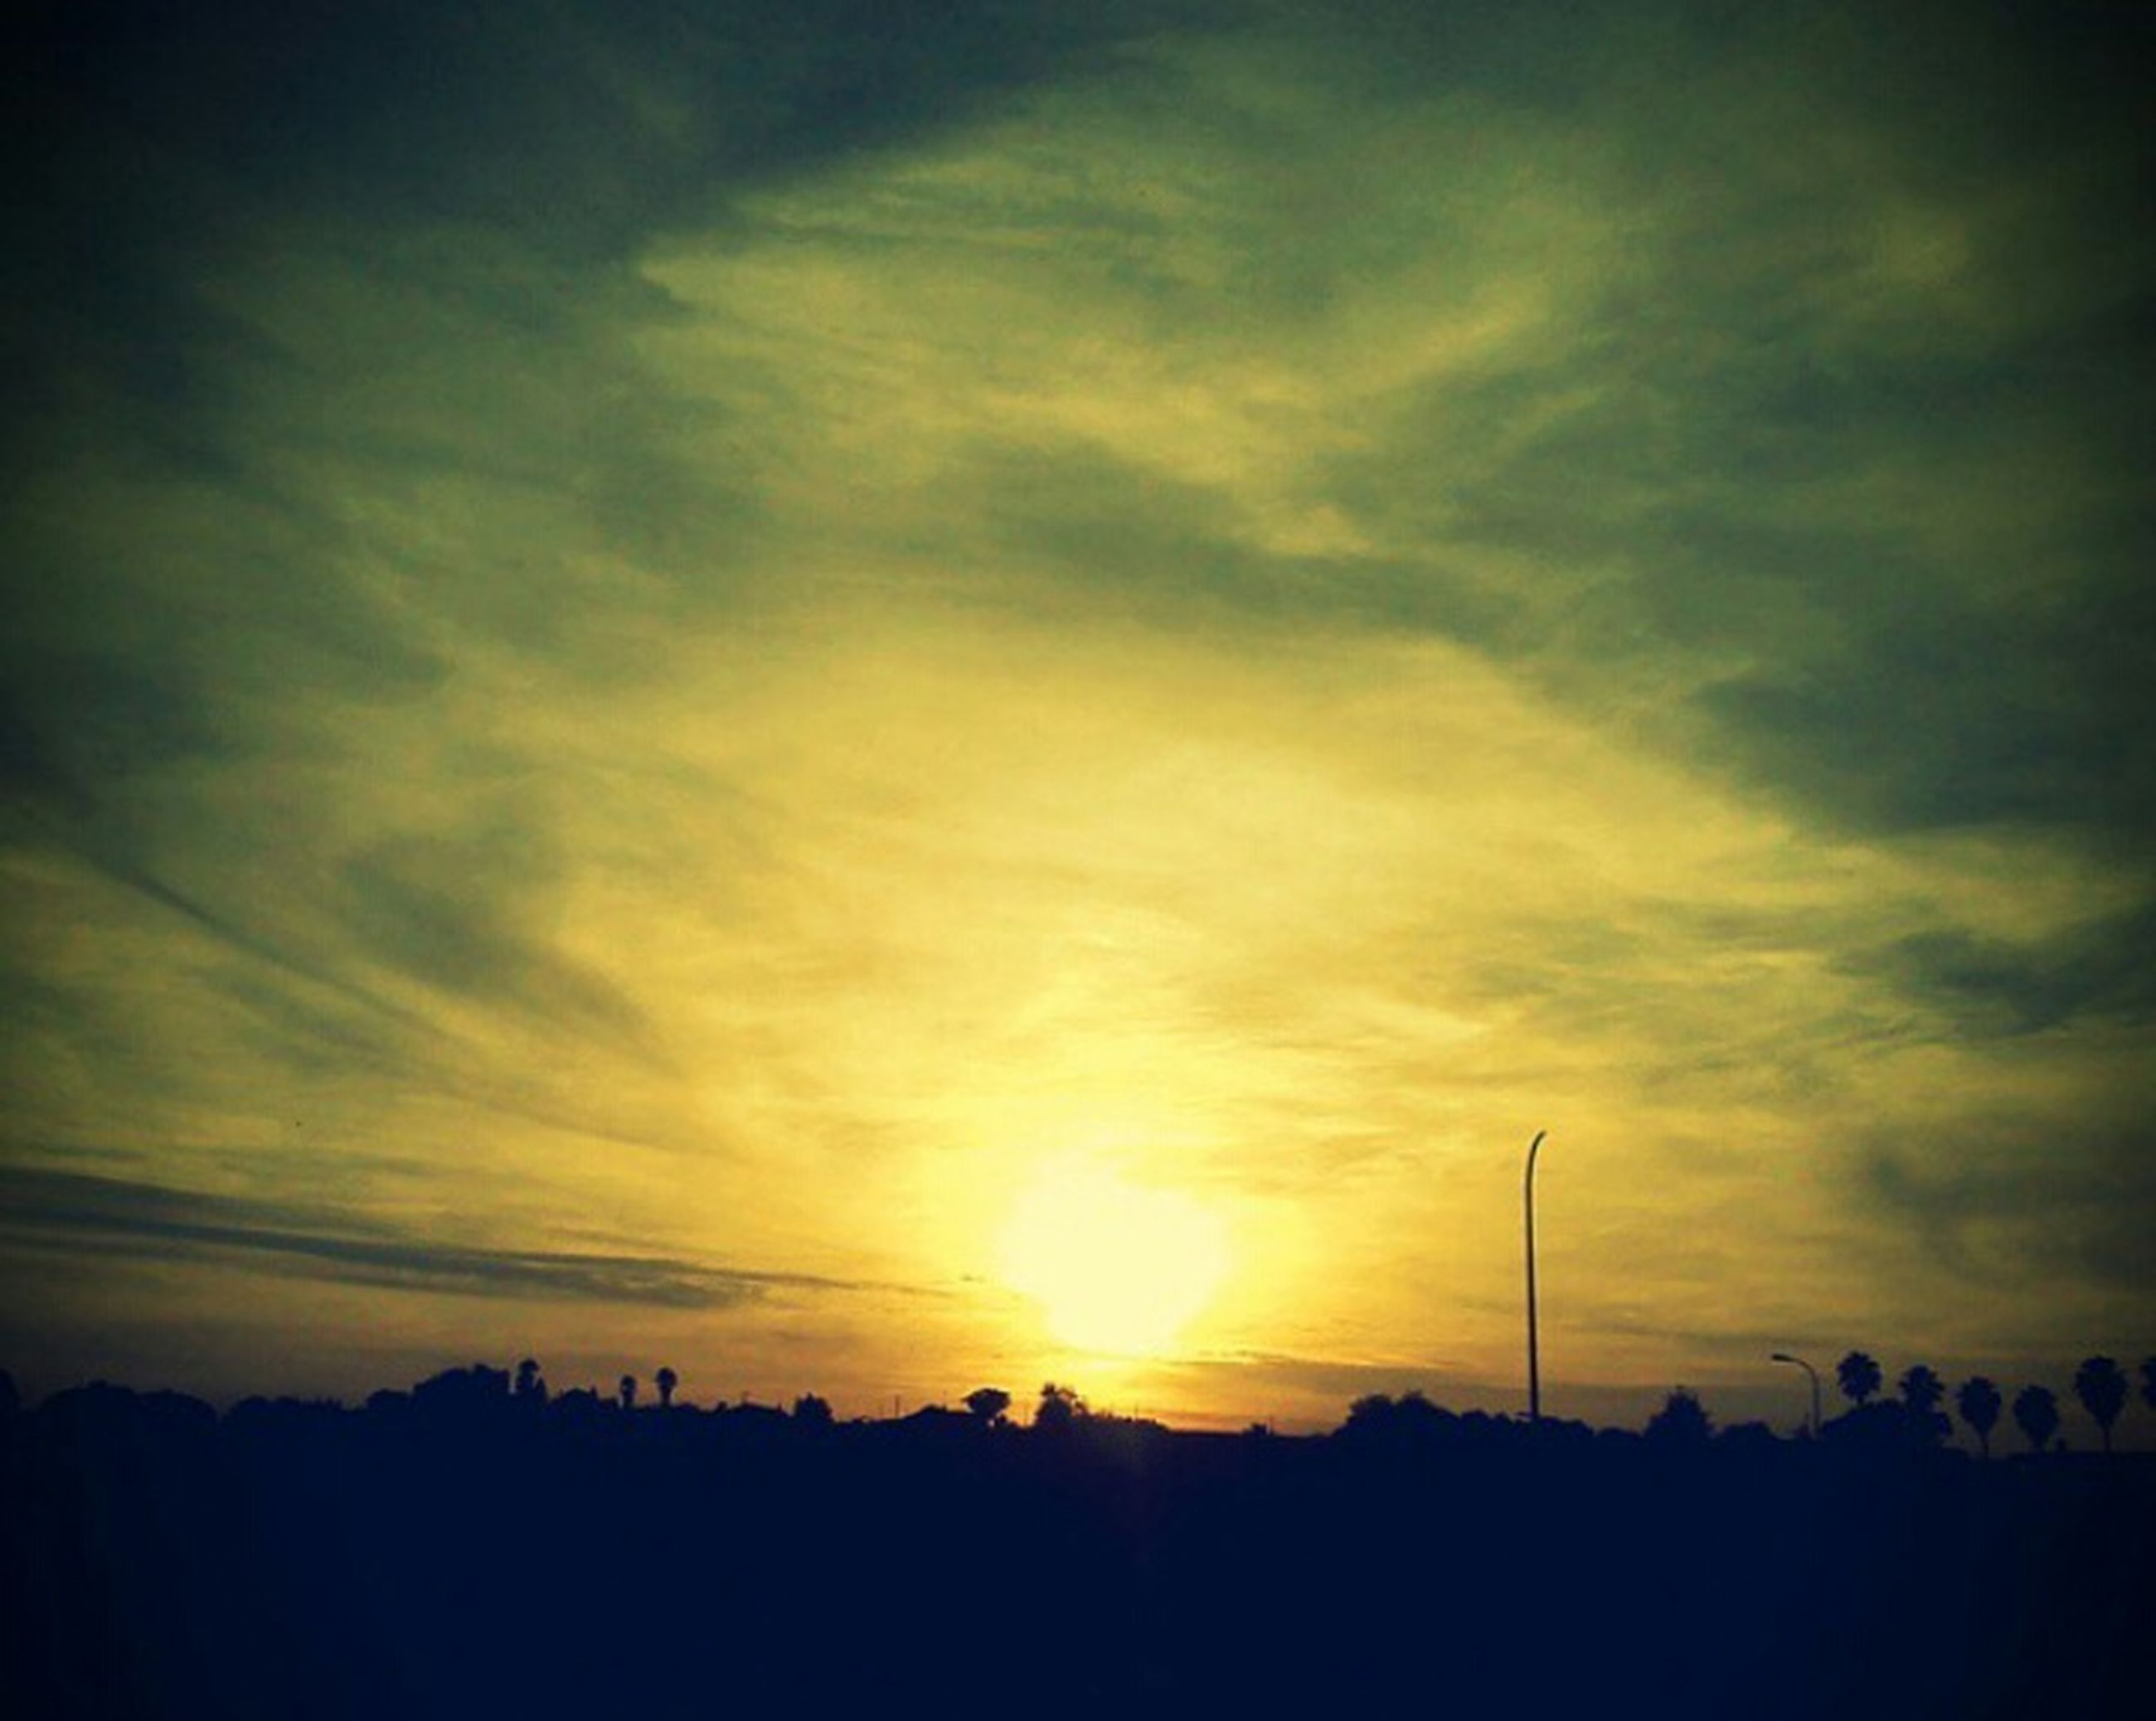 sunset, silhouette, sky, beauty in nature, scenics, cloud - sky, tranquil scene, tranquility, sun, orange color, nature, cloud, idyllic, landscape, sunlight, cloudy, dramatic sky, outdoors, outline, no people